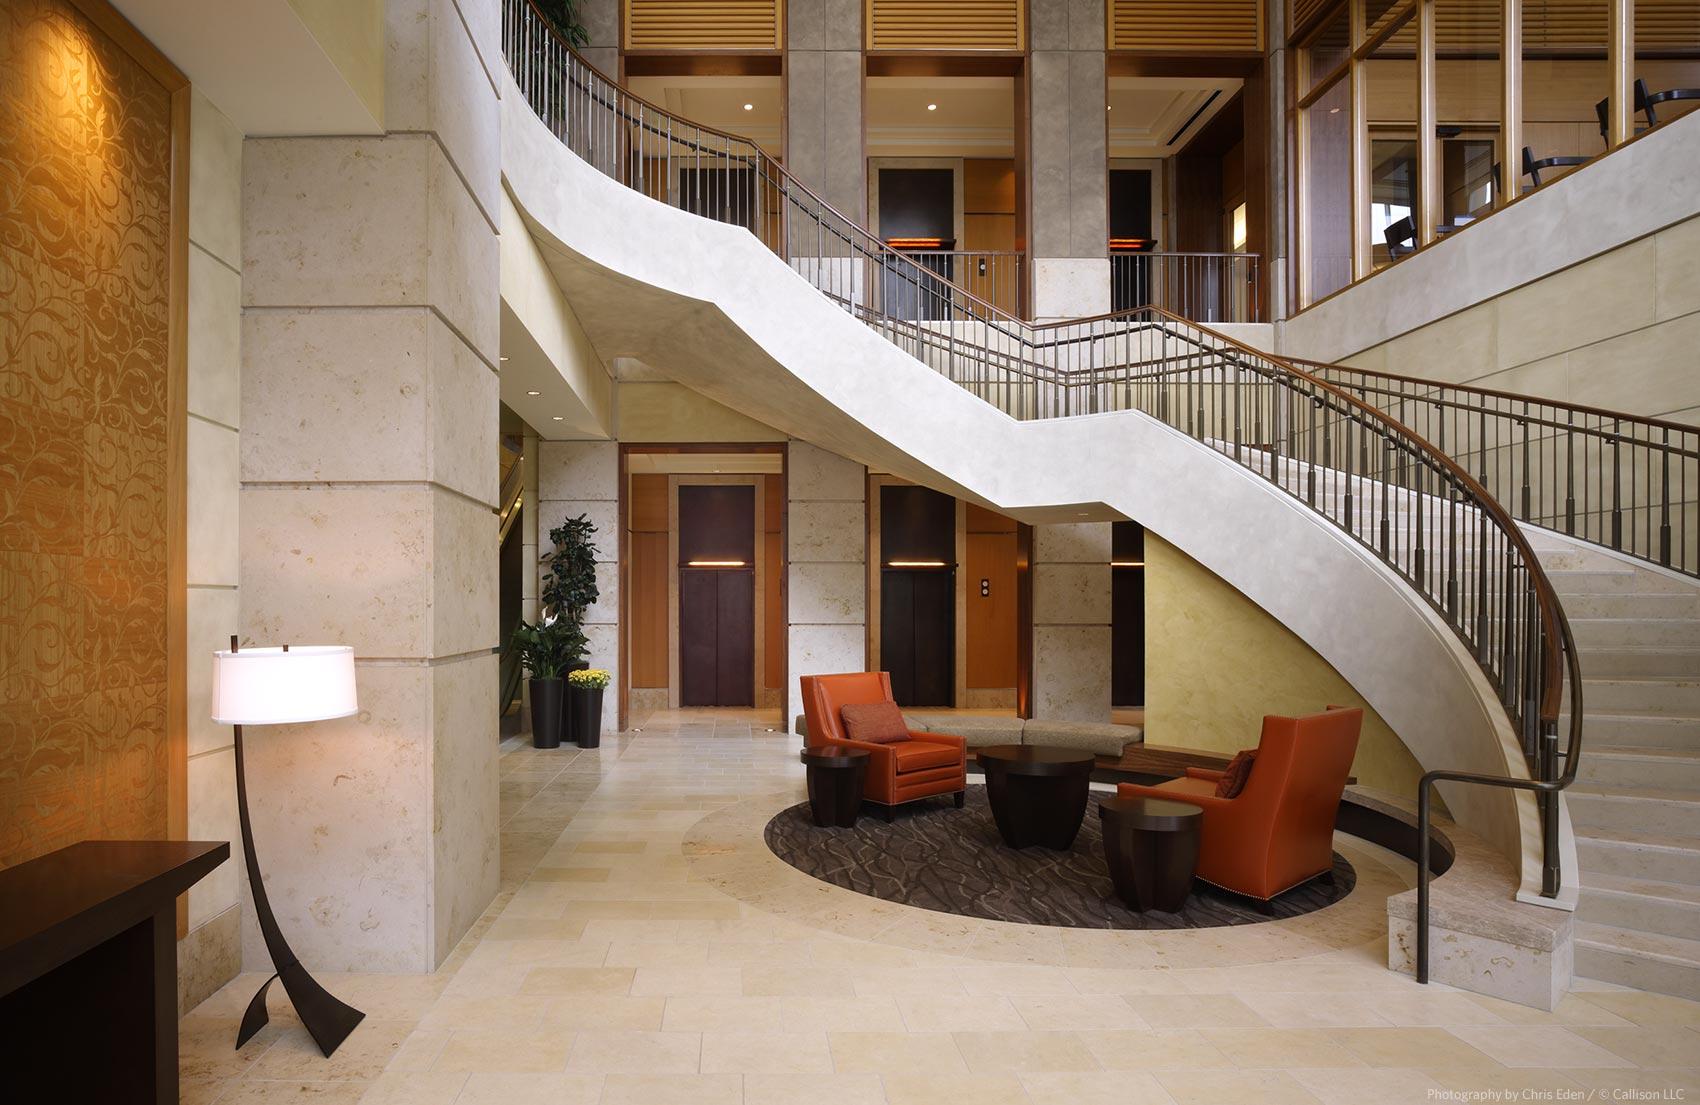 The Bravern, Bellevue, WA - Public lobby interior